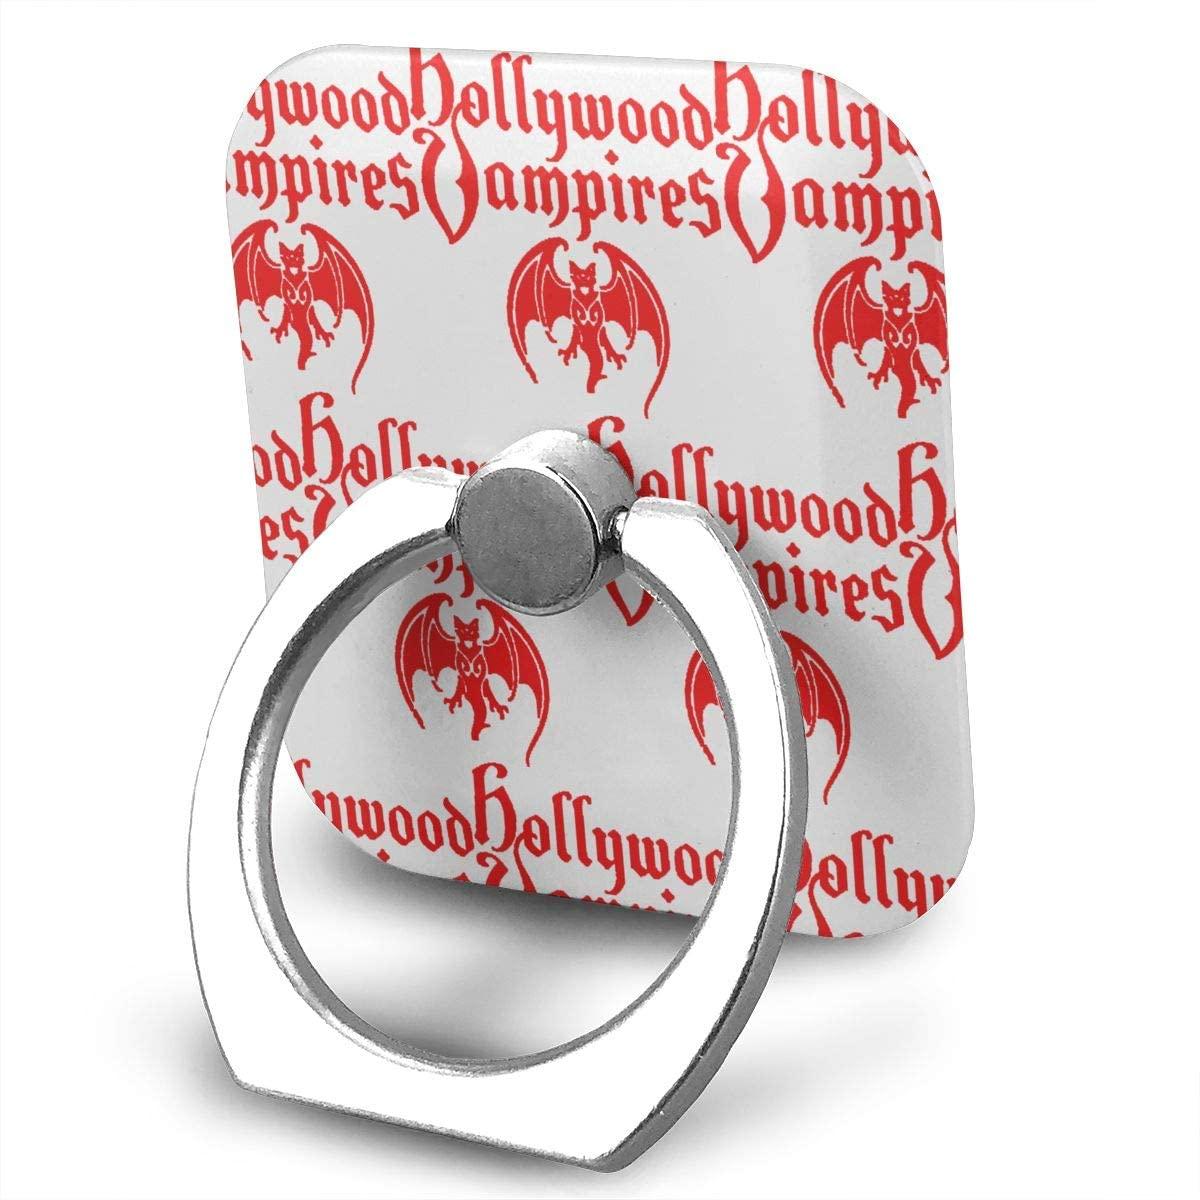 Hollywood Vampires Phone Finger Ring Stand Bracket Holder Smartphone Grip Stand Holder 360 Degree Rotating Sticky Cute